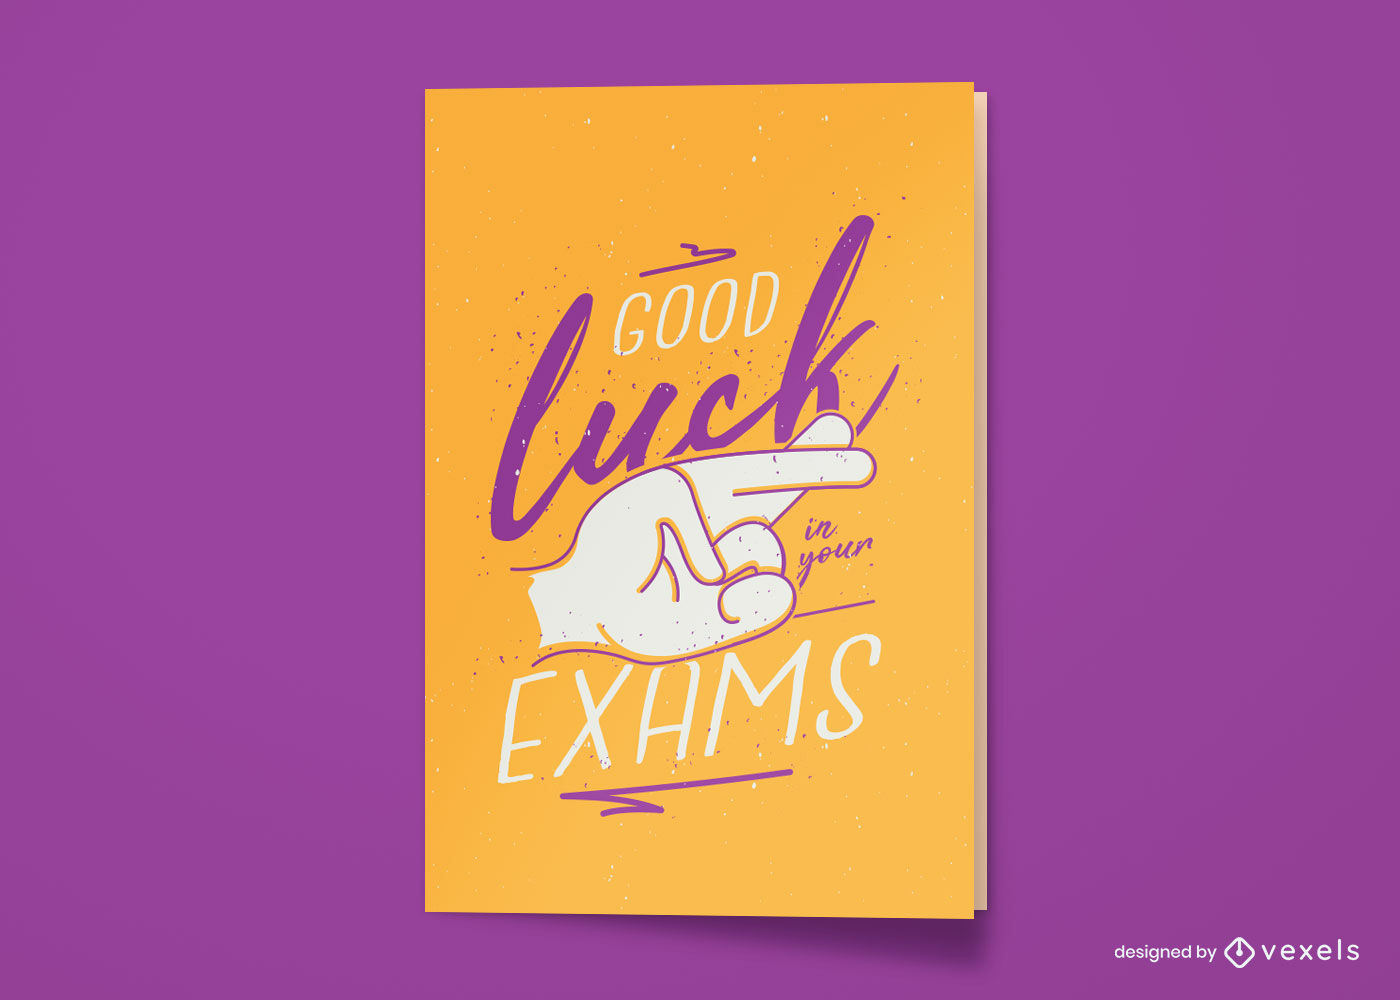 Good luck exam greeting card design